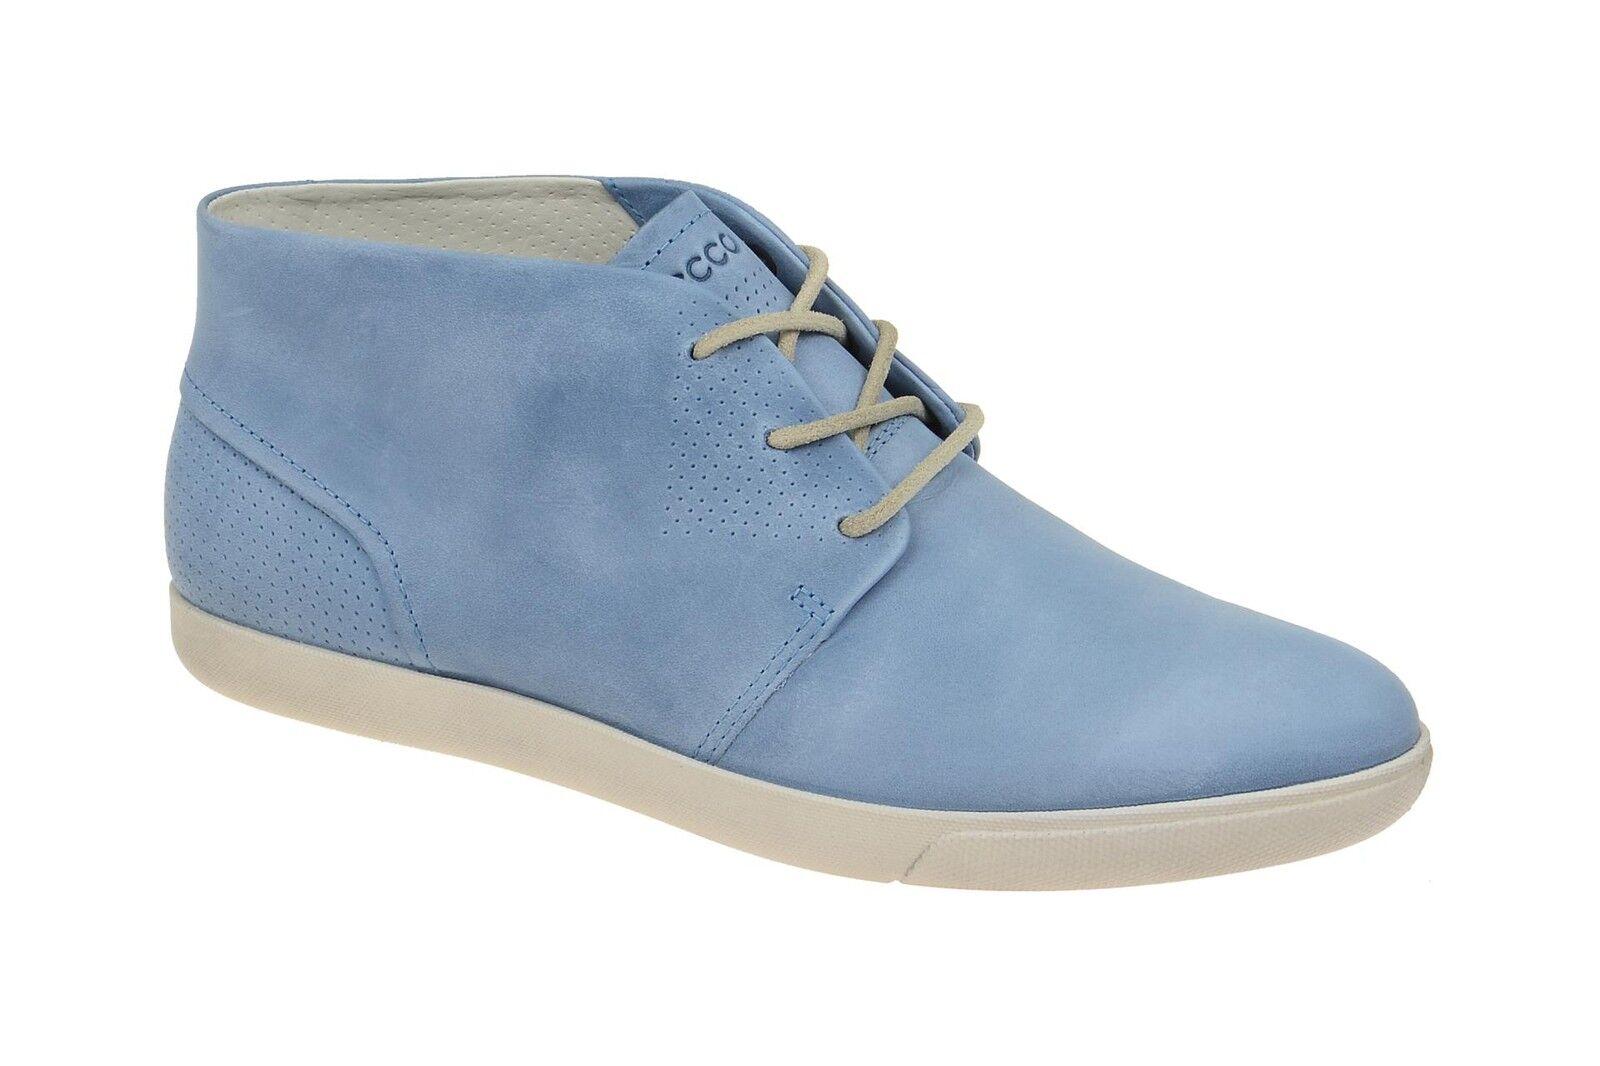 Ecco Chaussures Damara BLEU Chaussures Femmes Confortable A Lacets-Chaussures basses basses basses 24531302471 NEUF 10aa97